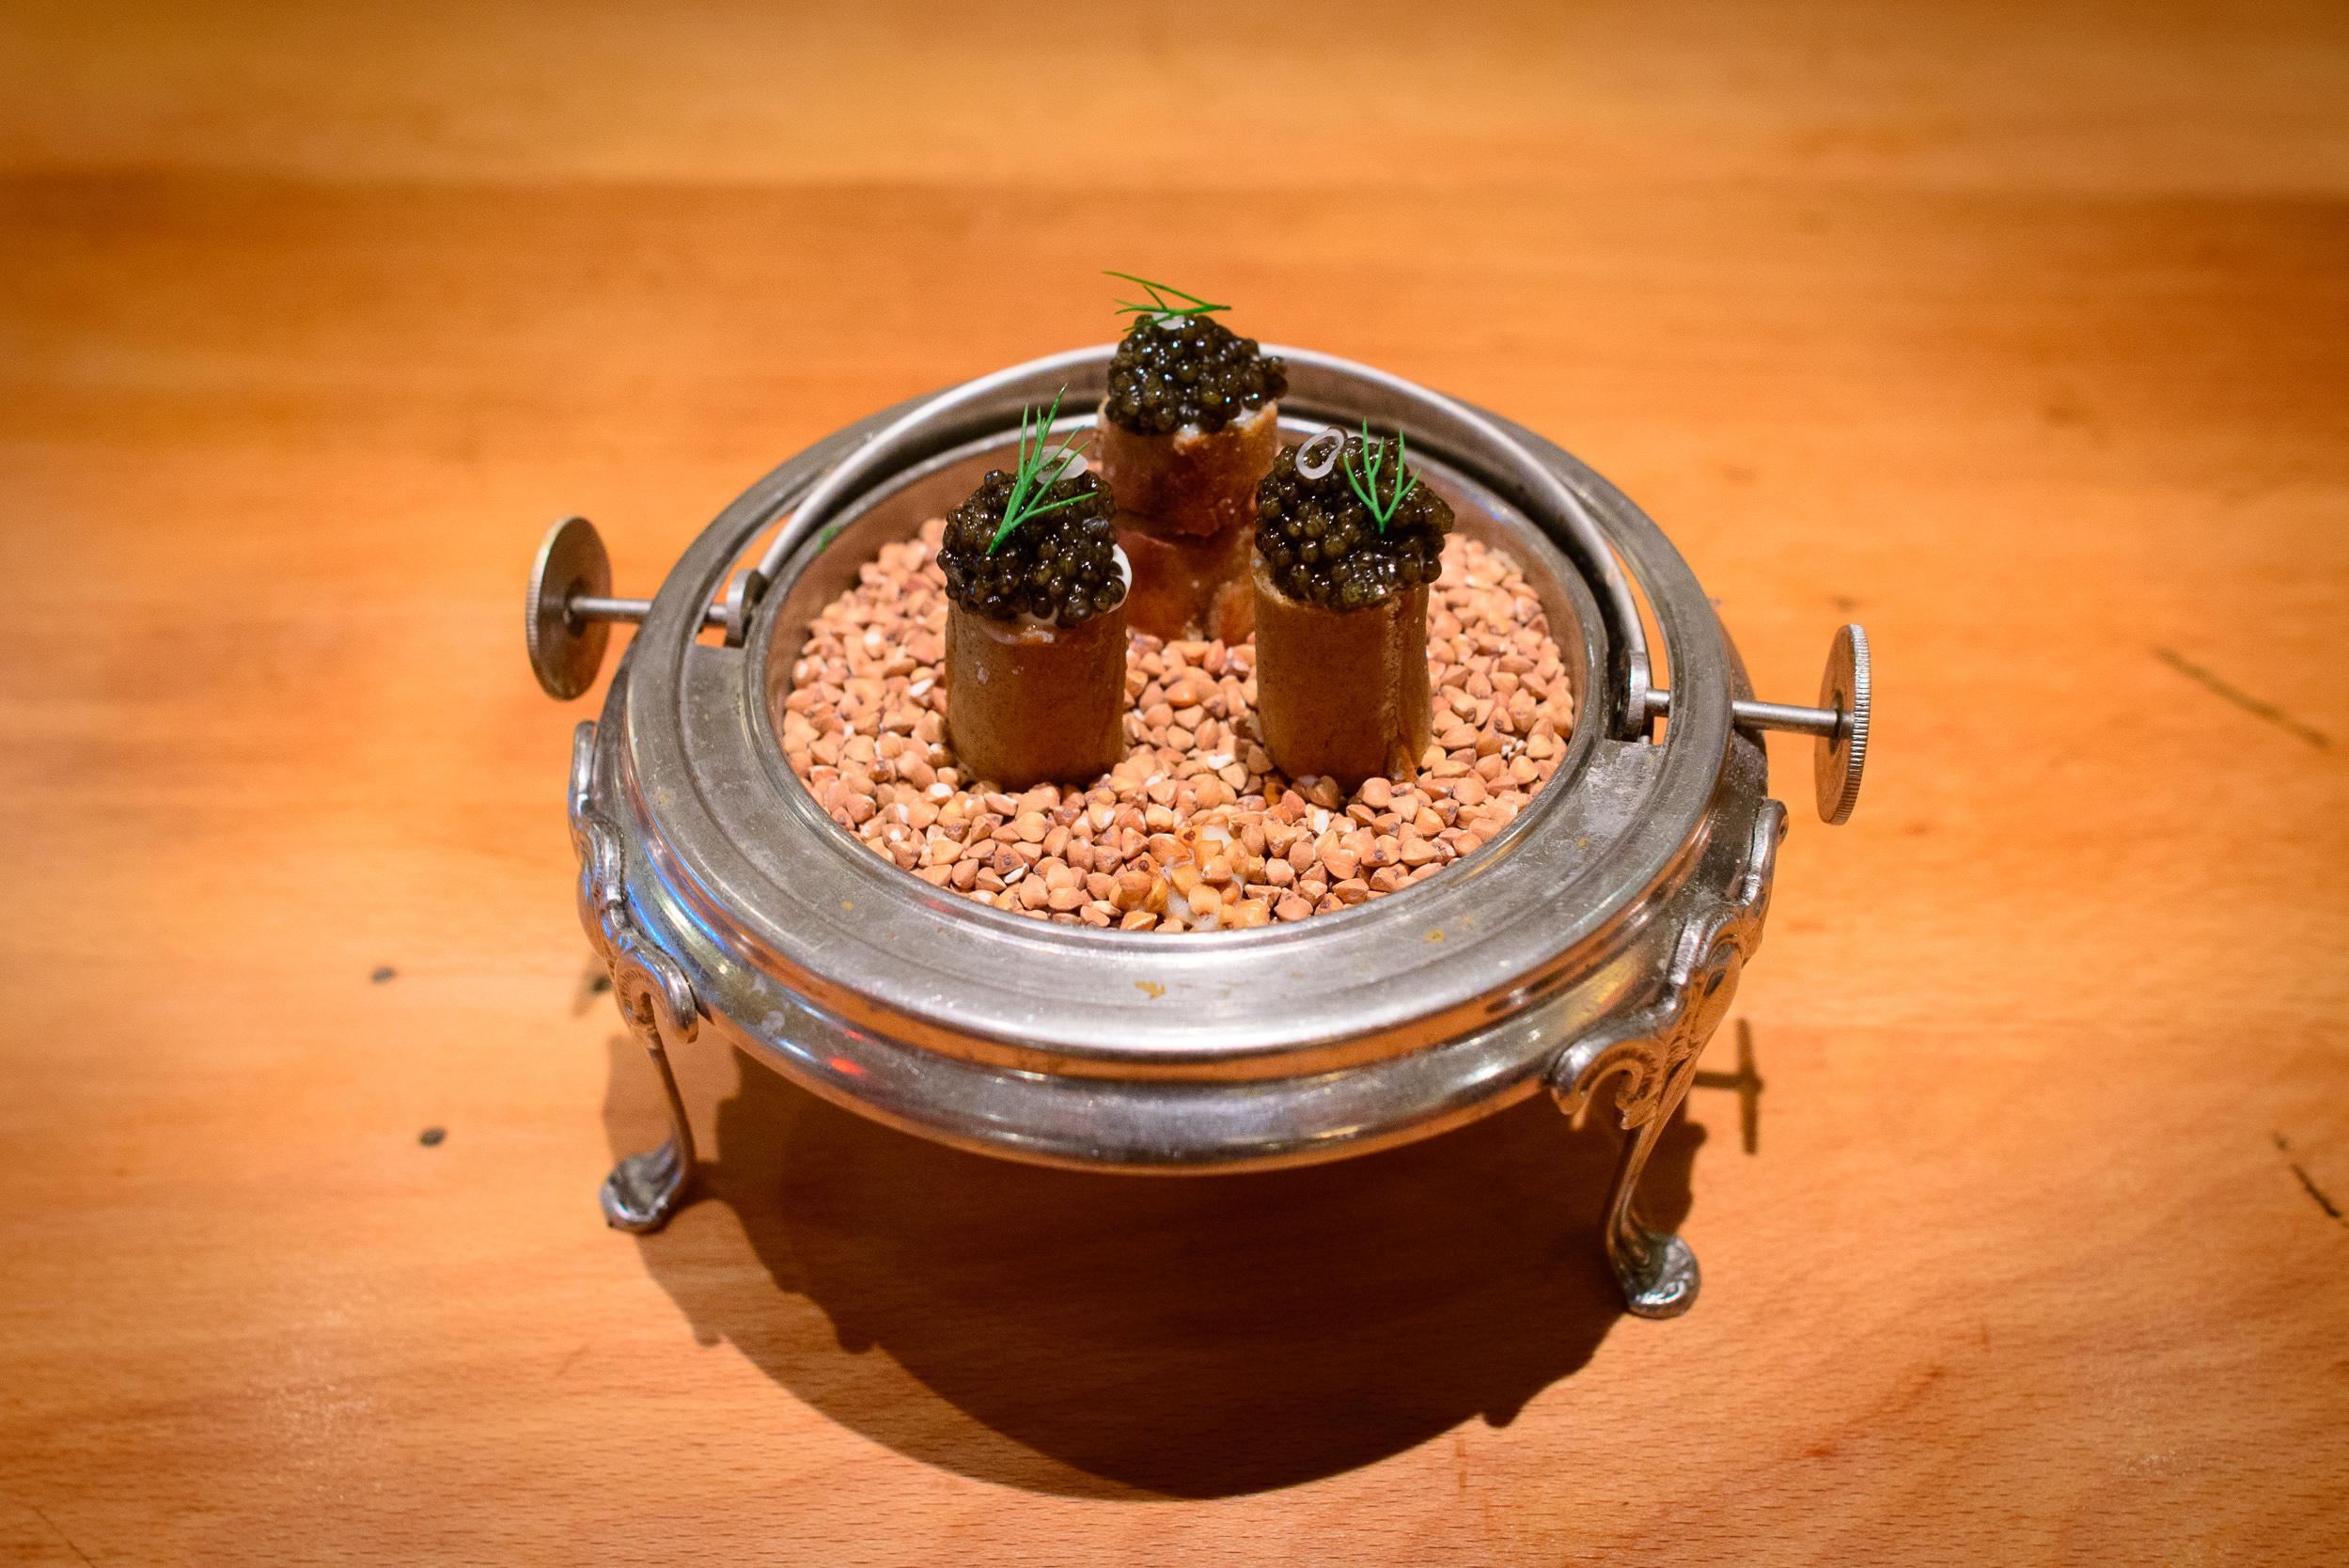 3rd Course: Buckwheat caviar knish, potato leek, crème fraîche